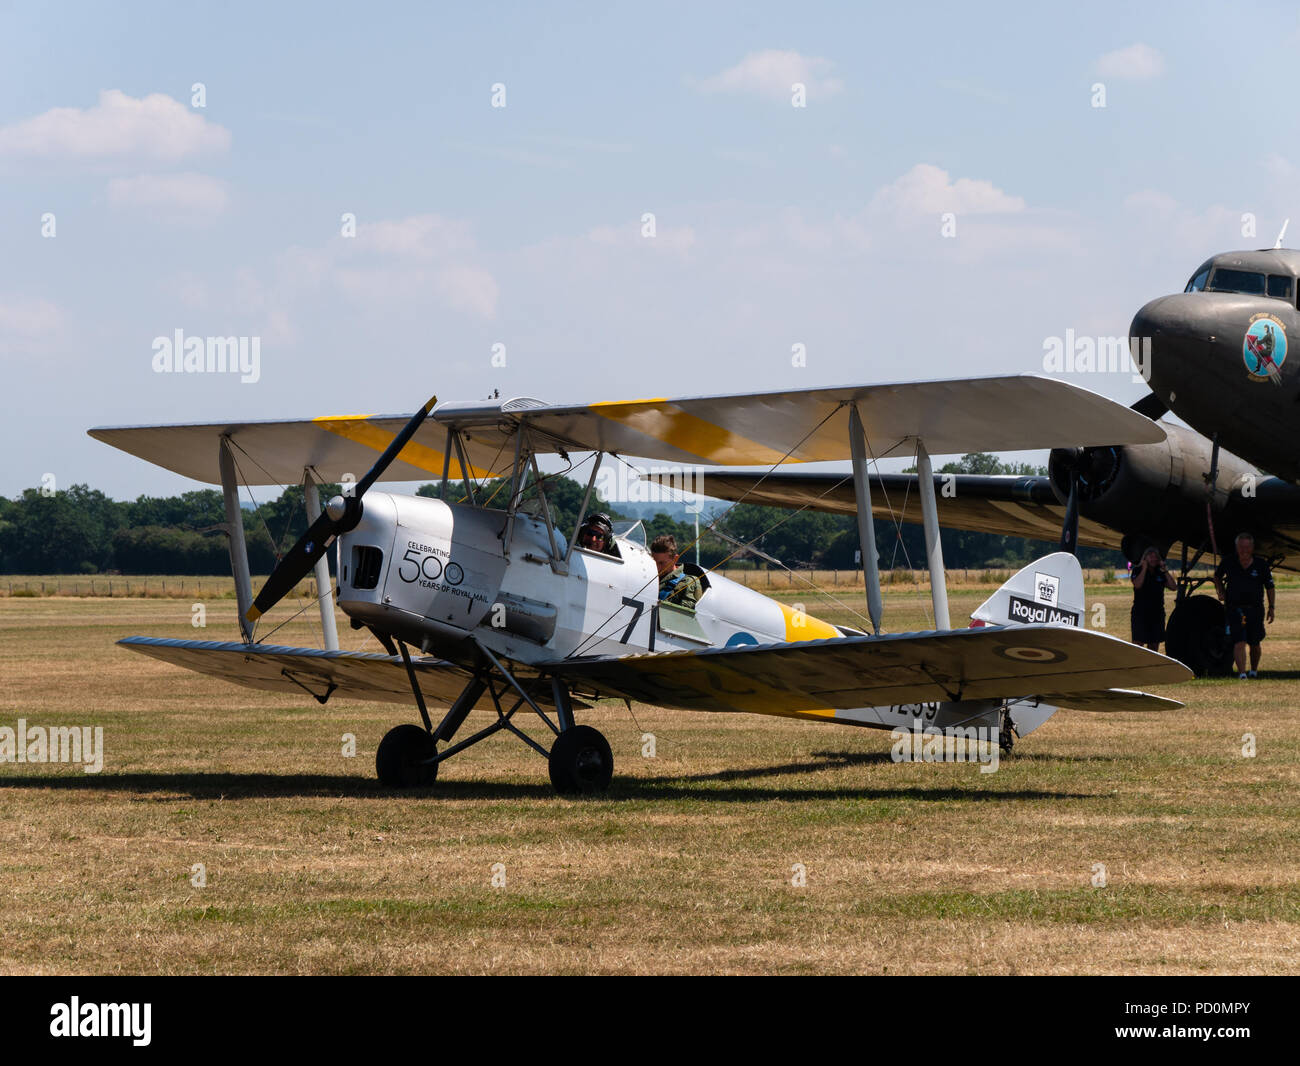 Tigermoth bi-plane aircraft, Headcorn, Kent, UK - Stock Image